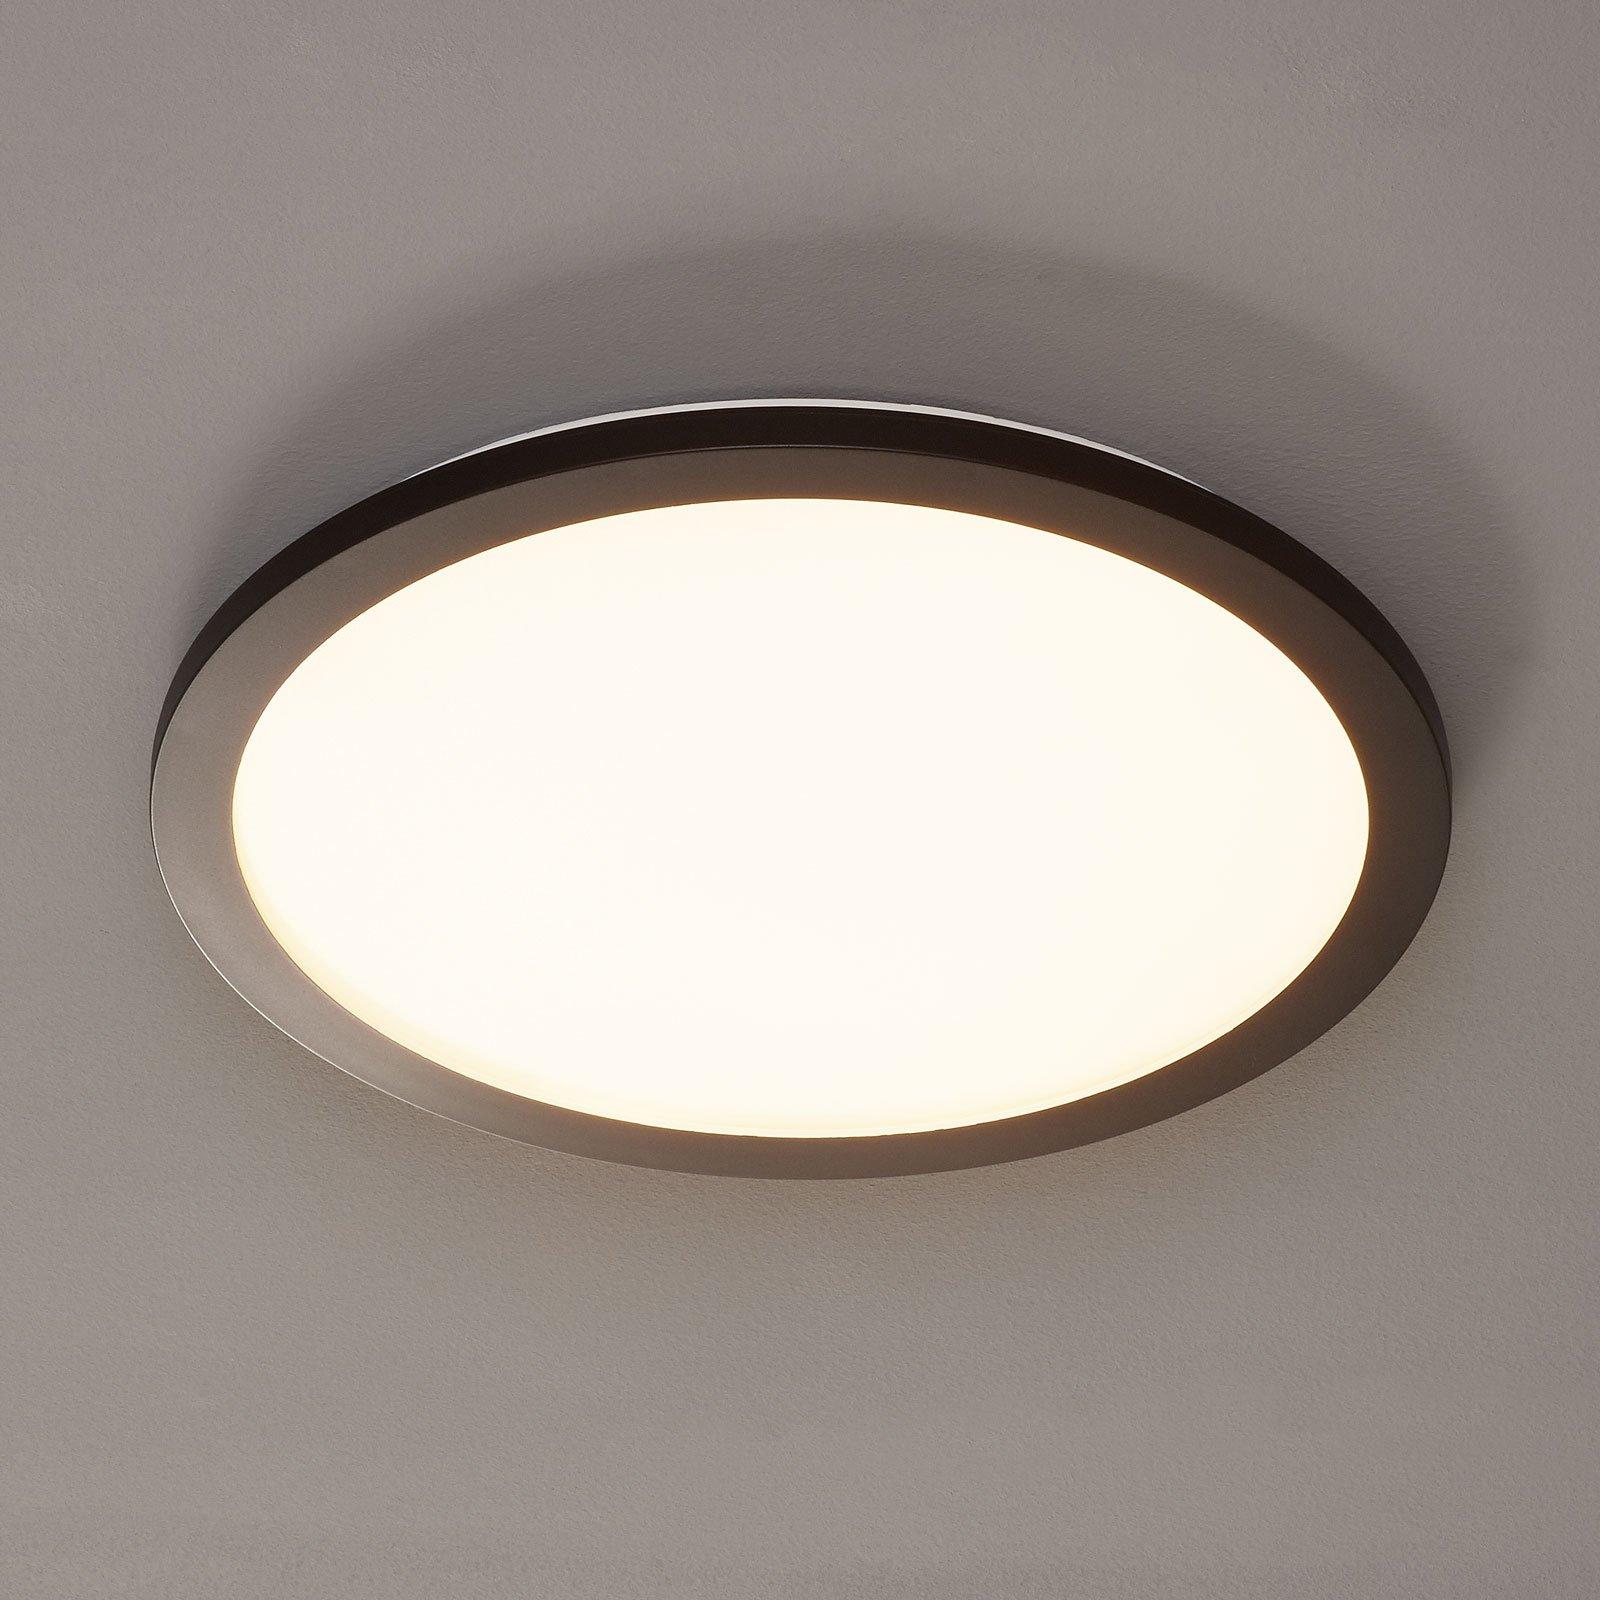 LED-taklampe Camillus, rund, Ø 40 cm